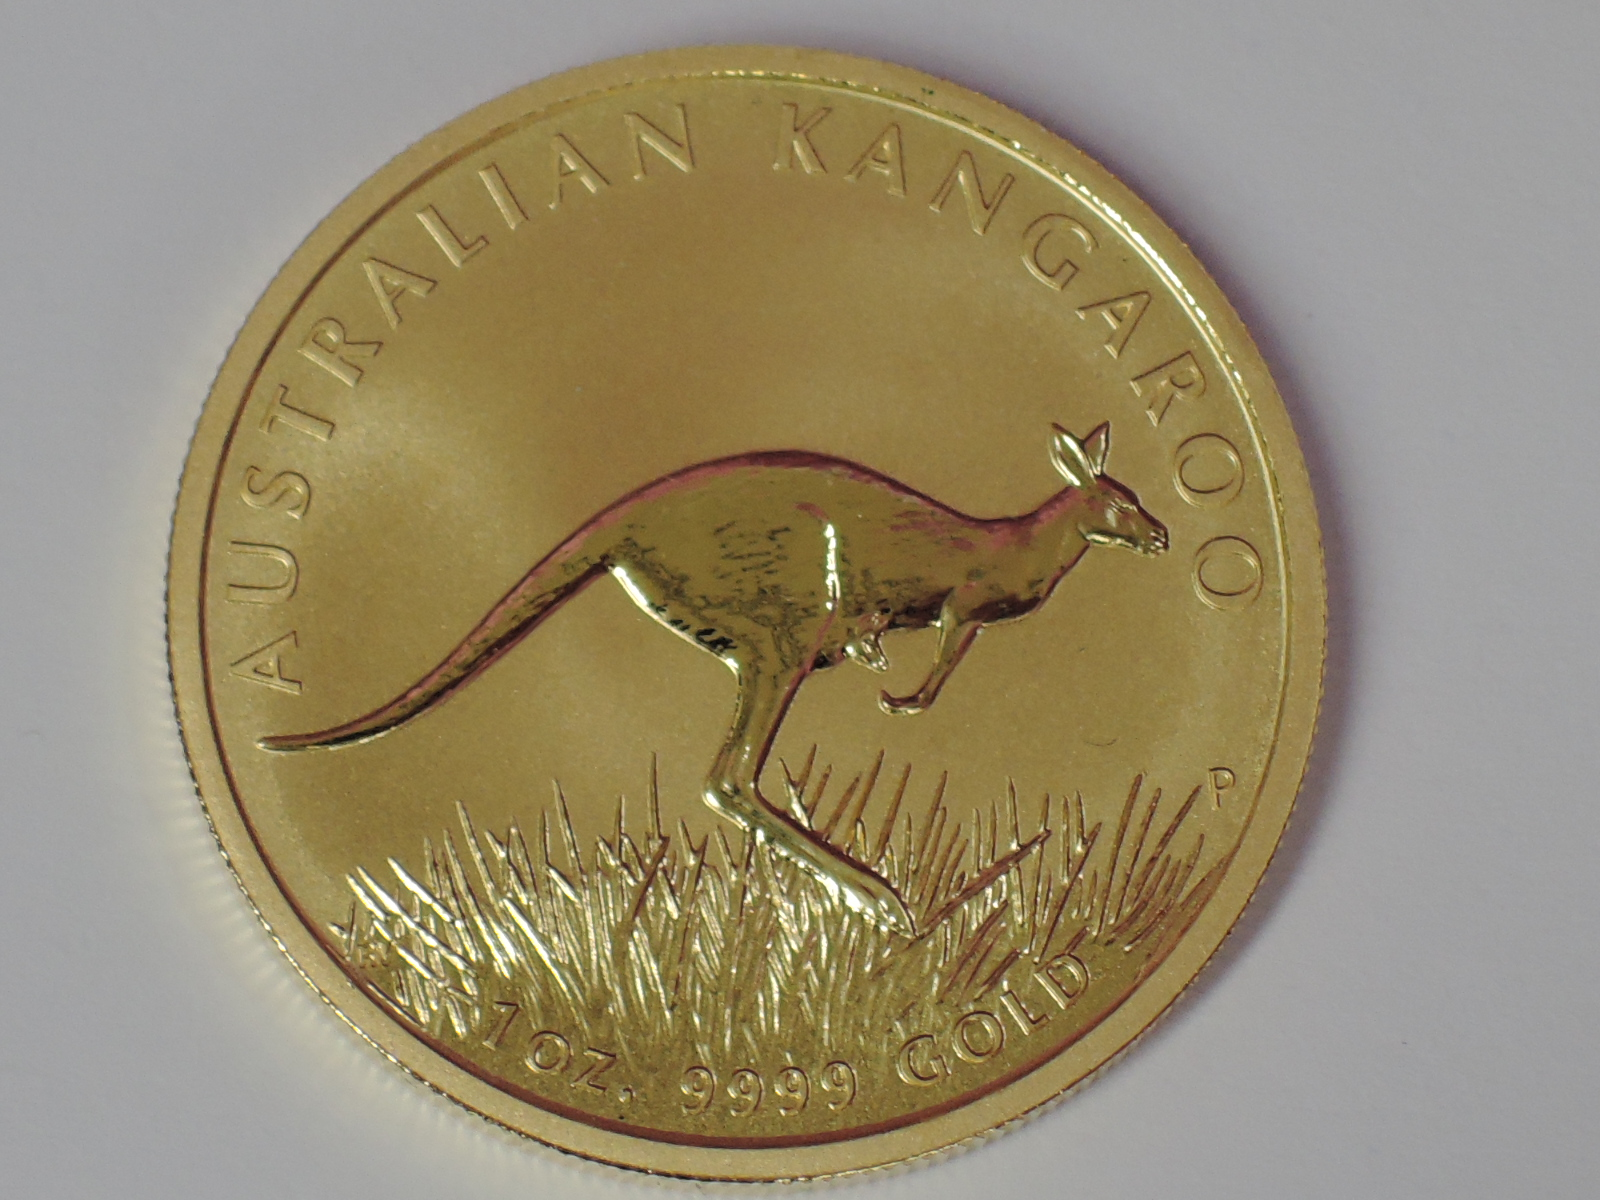 Lot 601 - A gold 1oz 2008 100 dollar Australian Kangaroo coin, in plastic case